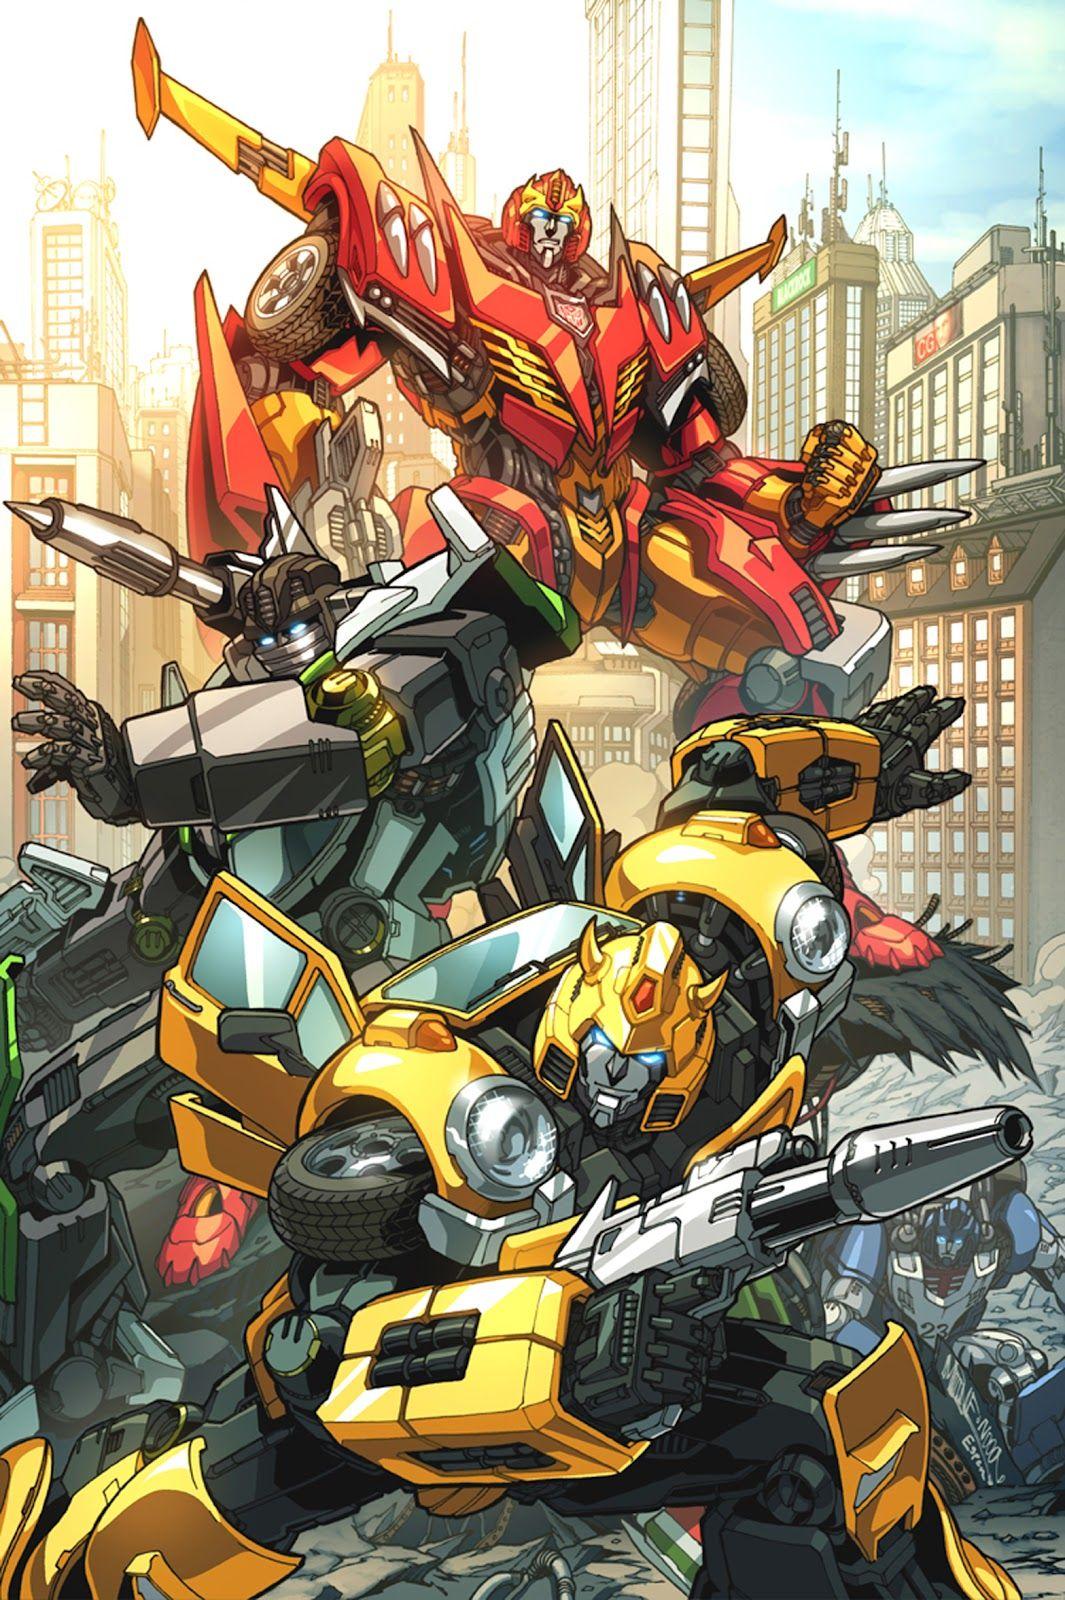 Transformersfallofcybertronautobotsposterwallpaper